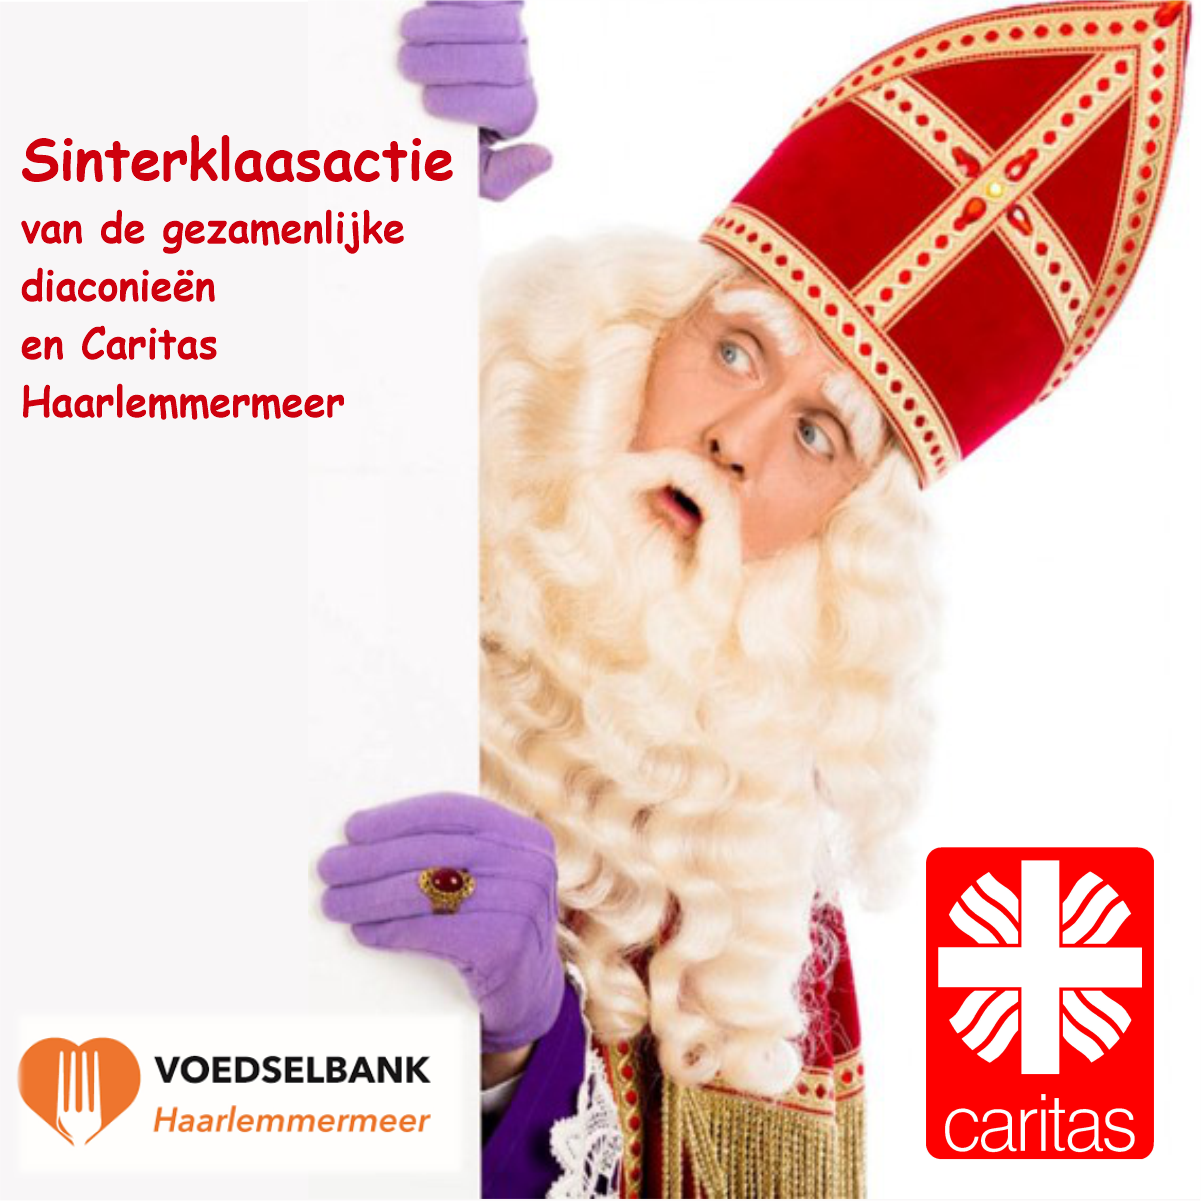 SinterklaasActoe Voedselbank